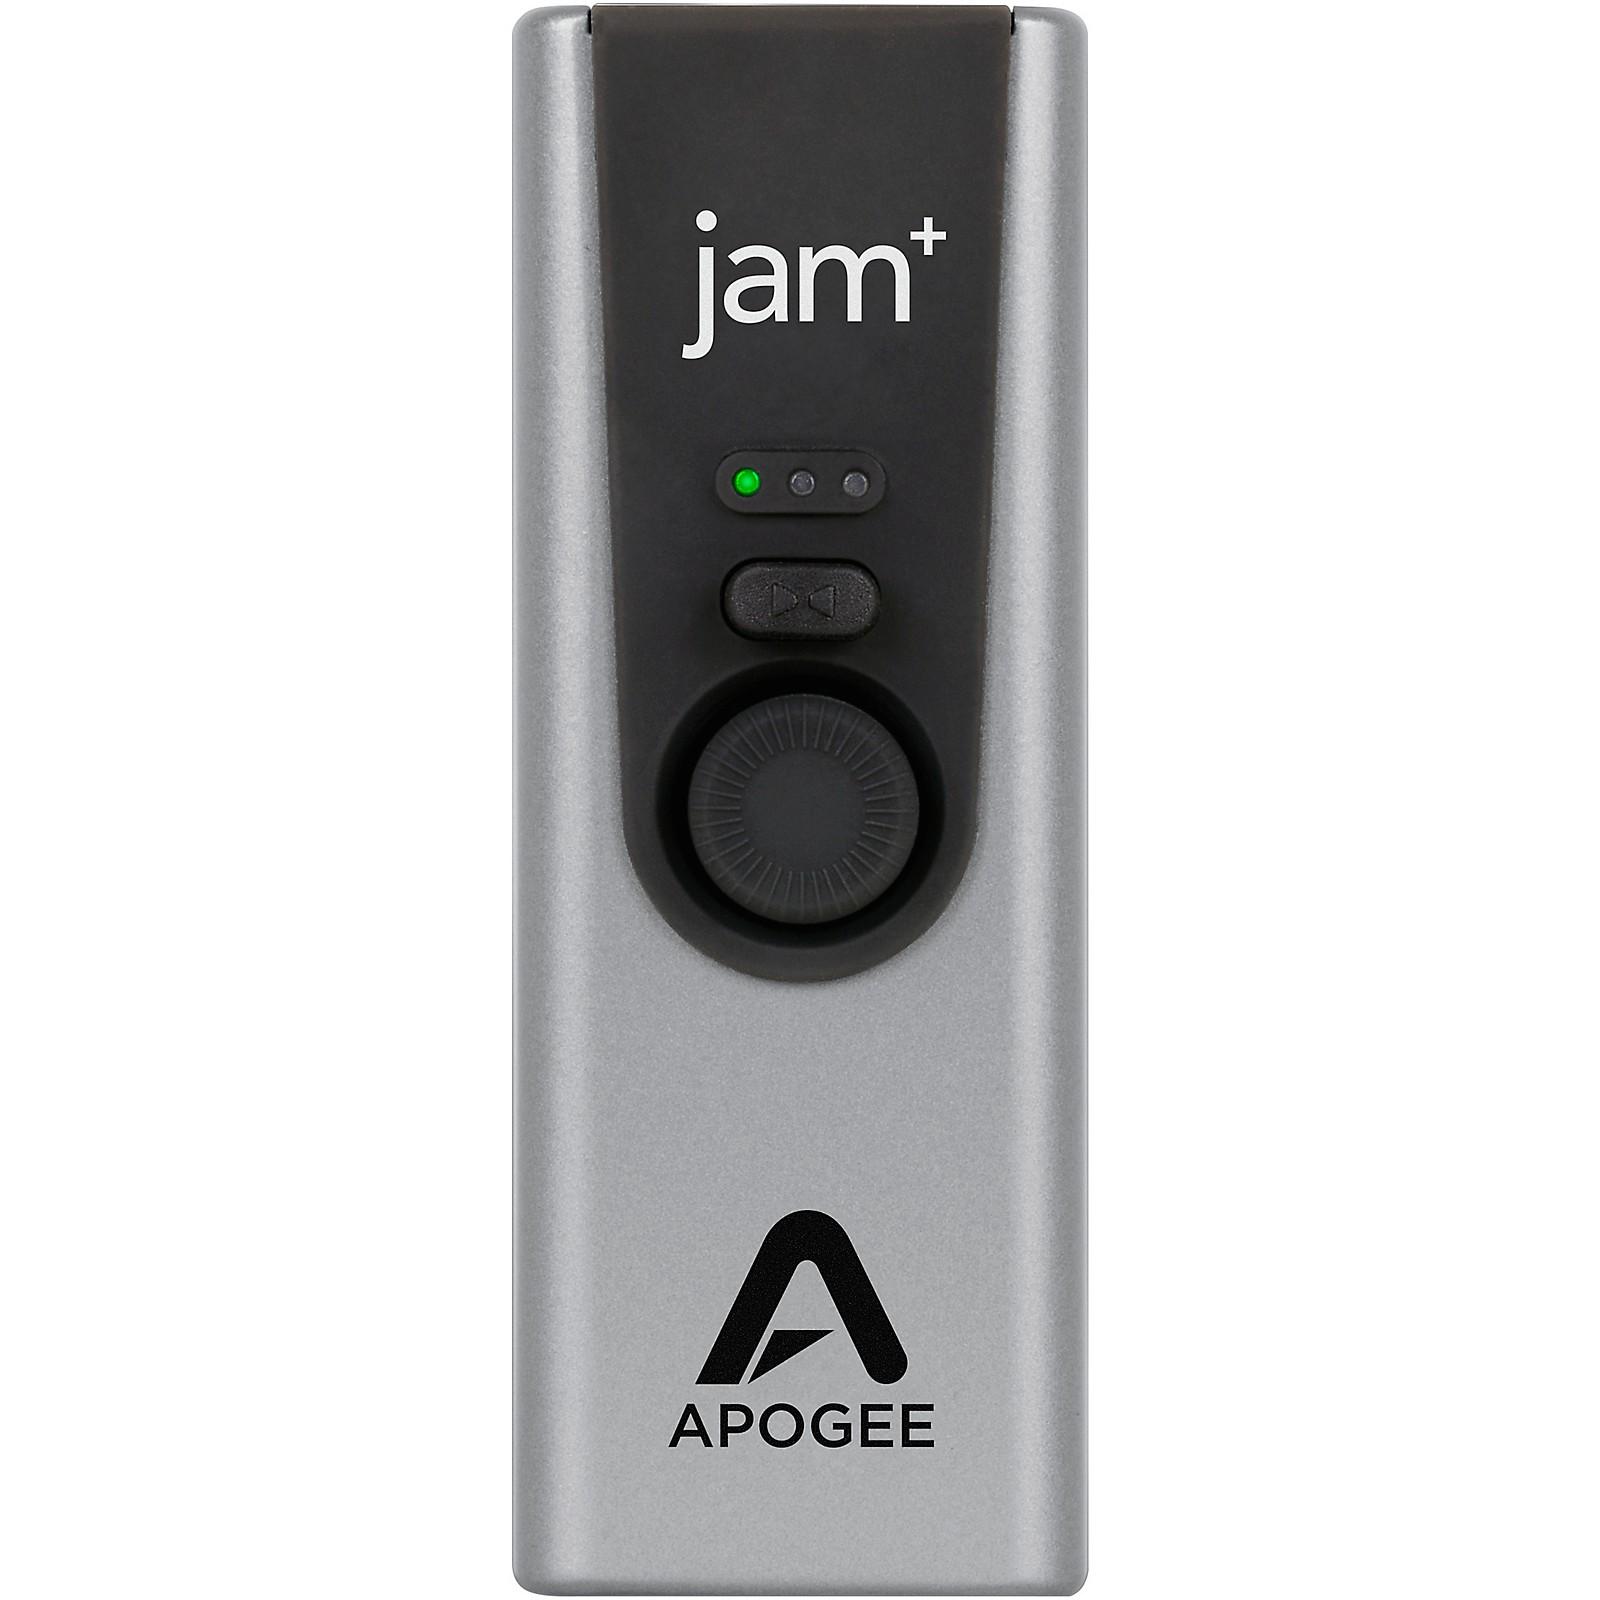 Apogee JAM PLUS